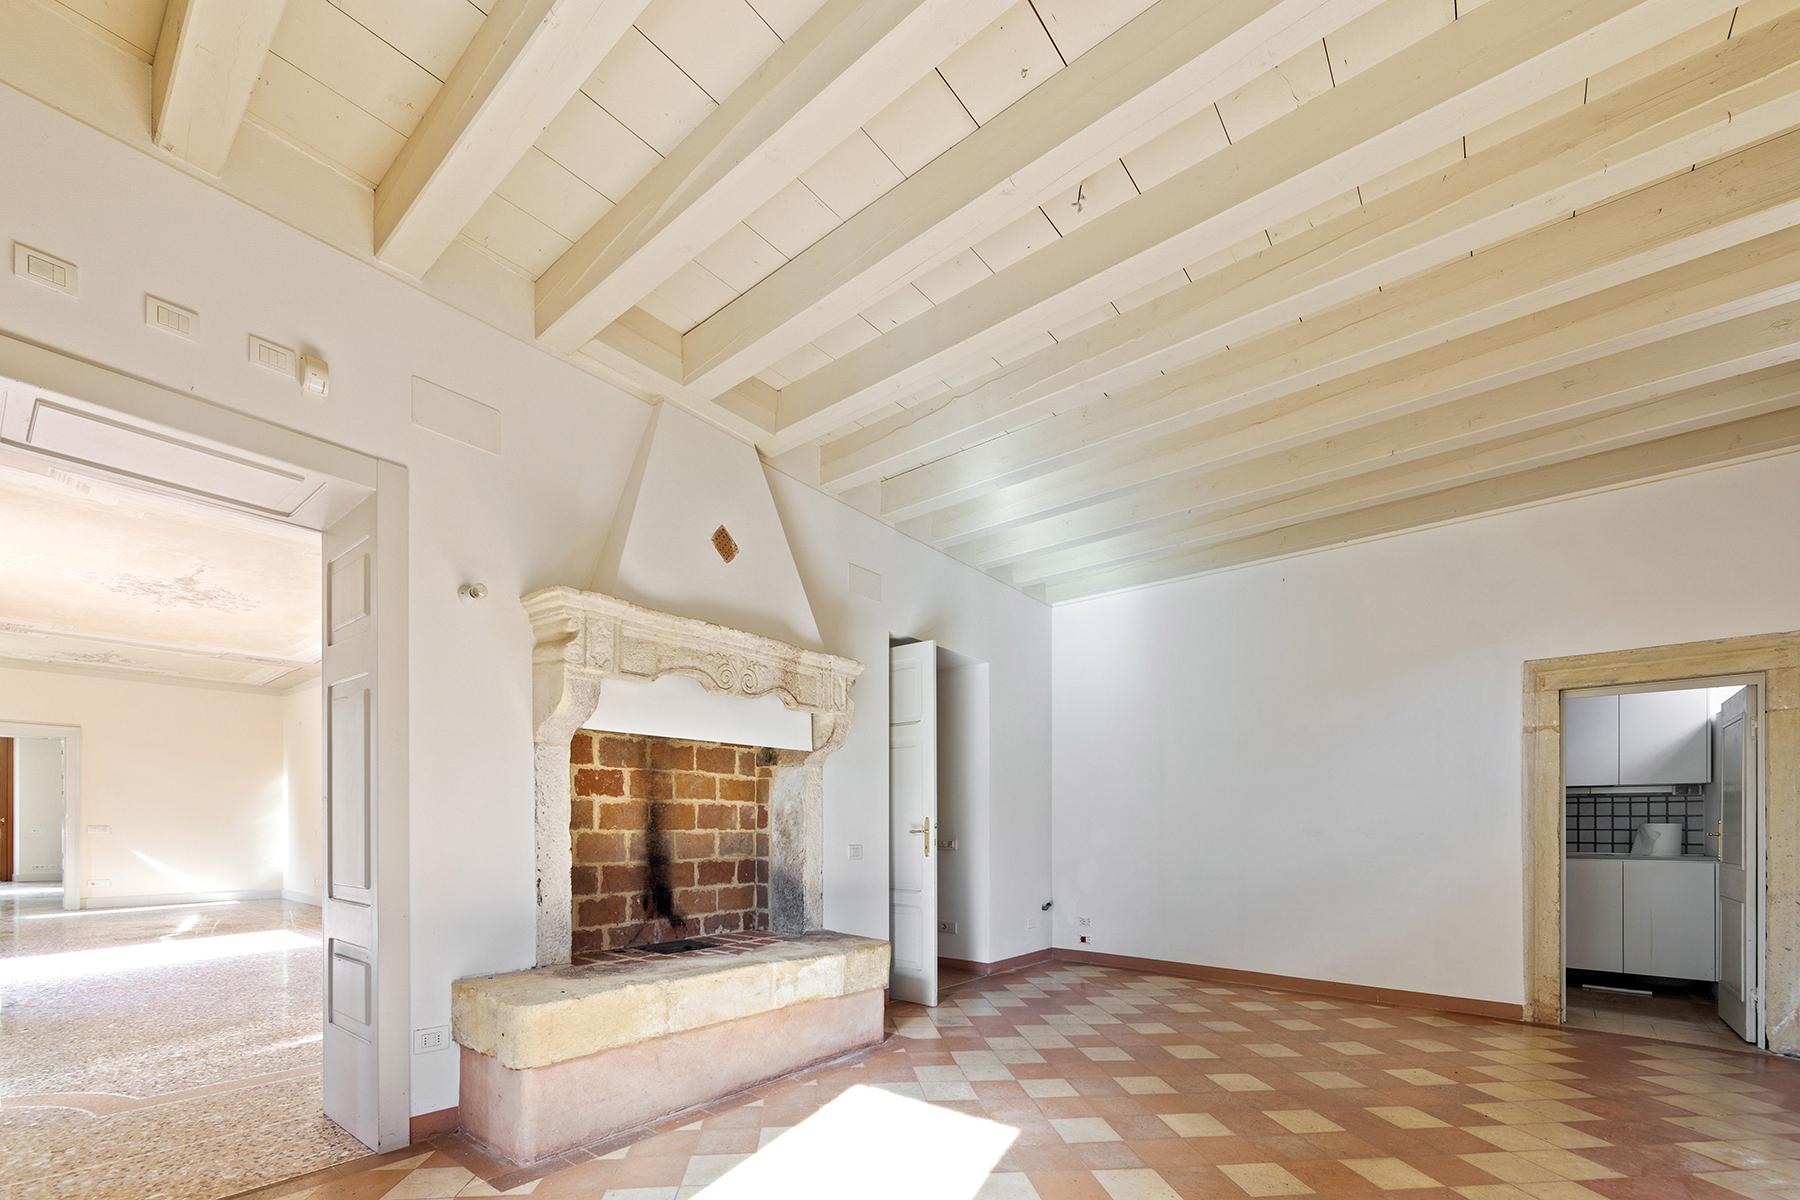 Villa in Vendita a Verona: 5 locali, 890 mq - Foto 11